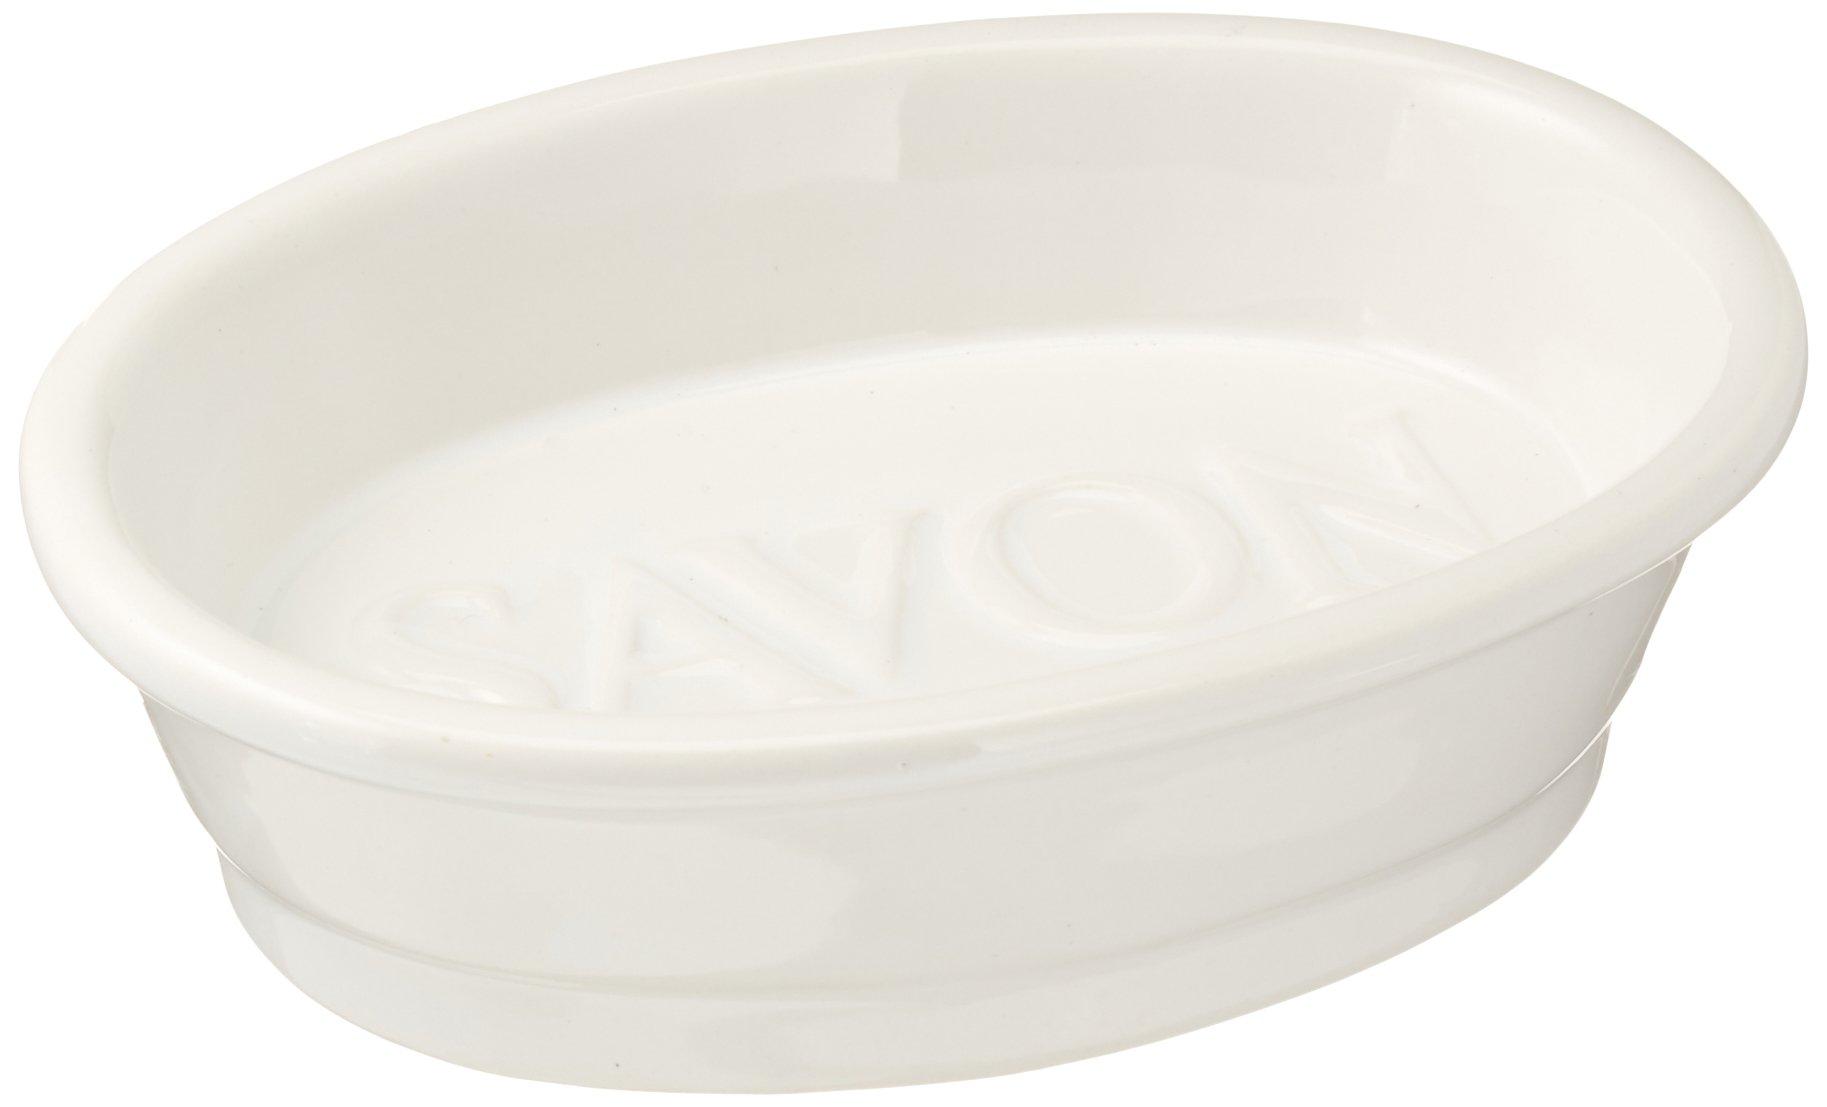 Abbott Collection White Oval Savon Dish by Abbott Collection (Image #1)